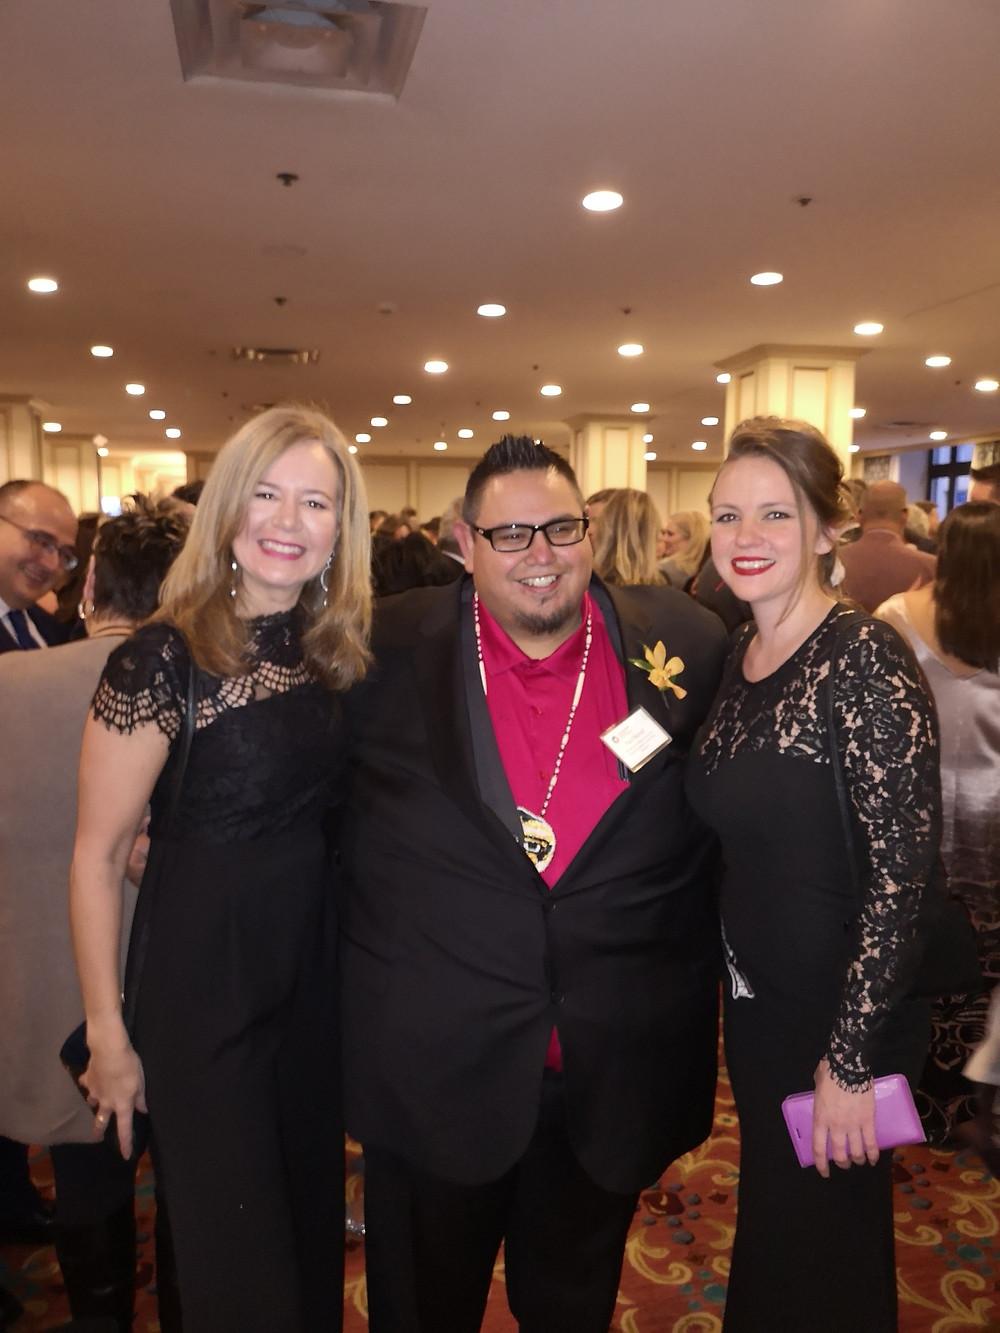 Loa Fridfinnson, Paul Natrall and Lisa Peterson